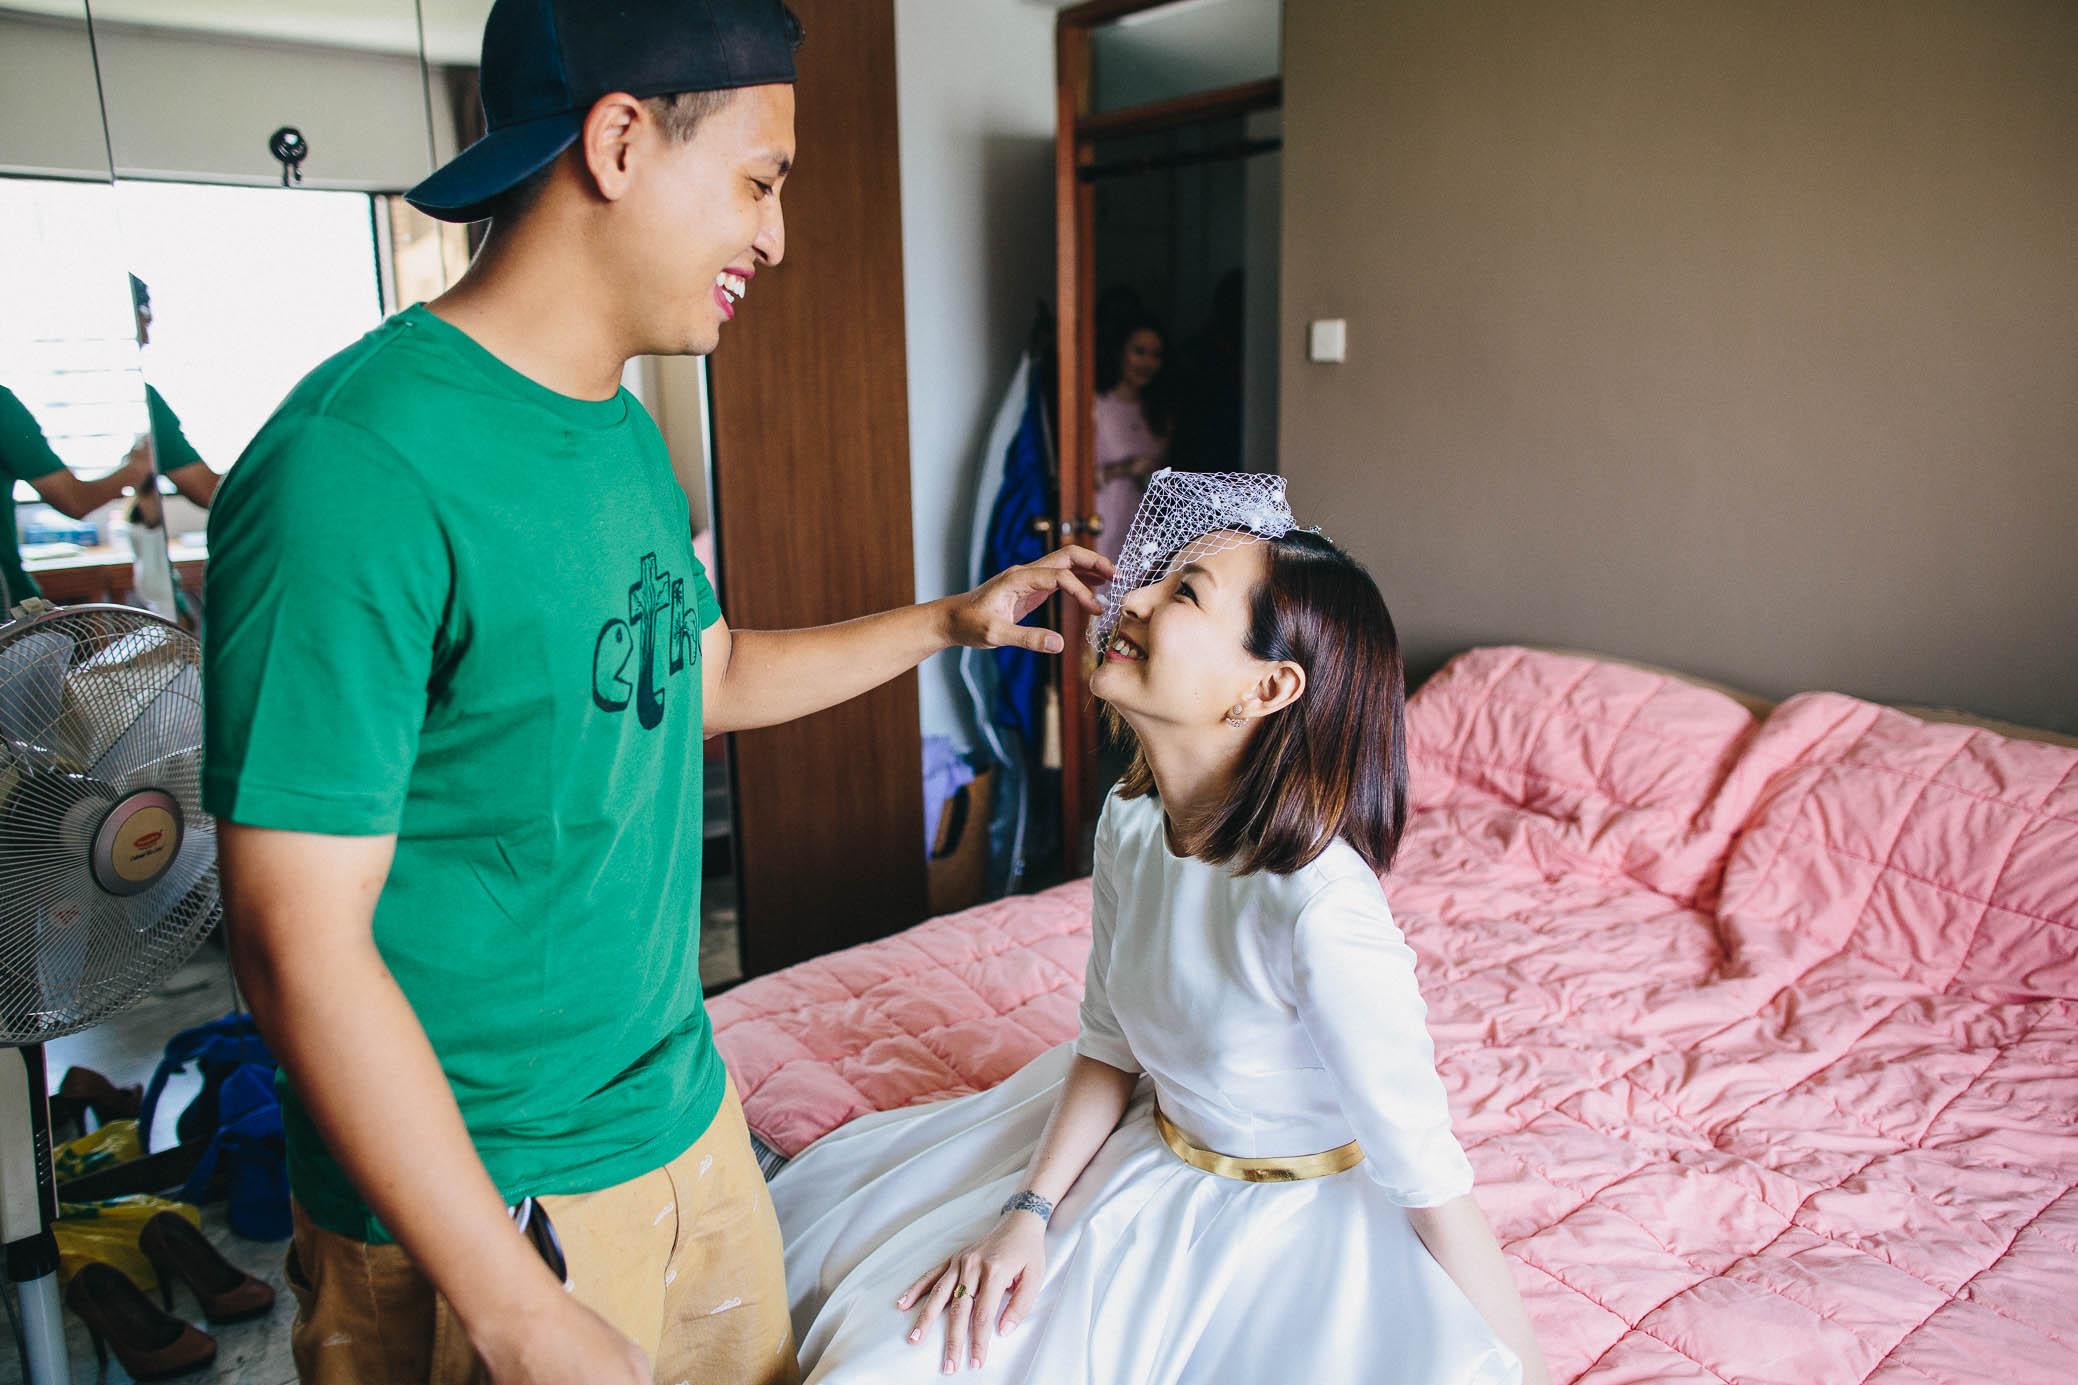 singapore-wedding-photographer-malay-indian-pre-wedding-travel-wmt-2015-alif-ethel-22.jpg